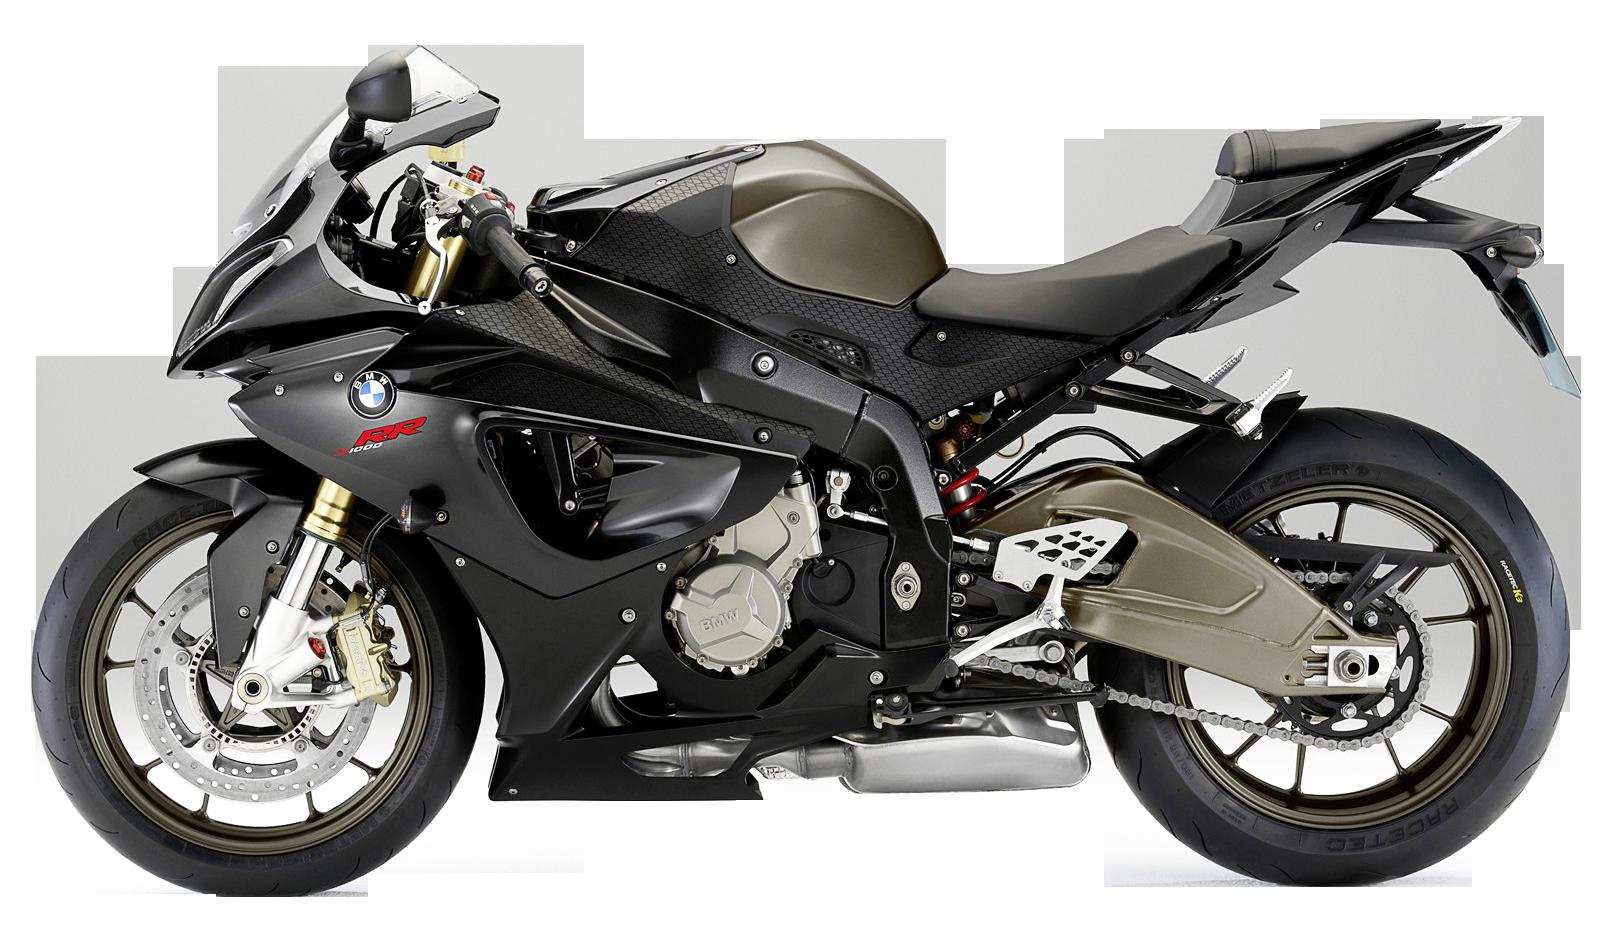 Bmw S1000rr Black Png Image Super Bikes Bmw S1000rr Bike